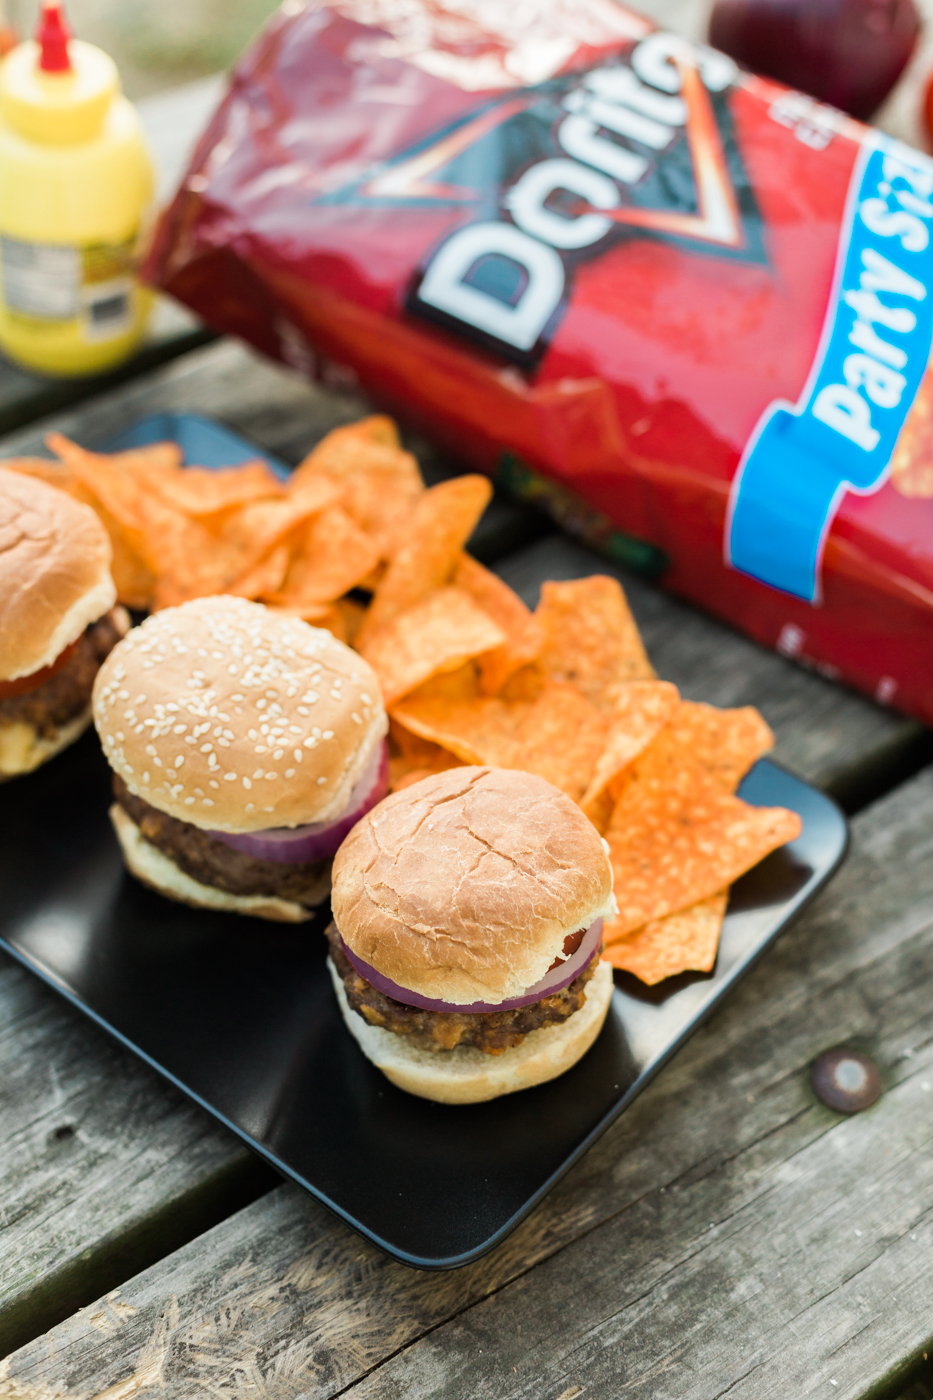 In partnership with Frito-Lay |  Doritos Three Cheese Stuffed Sliders